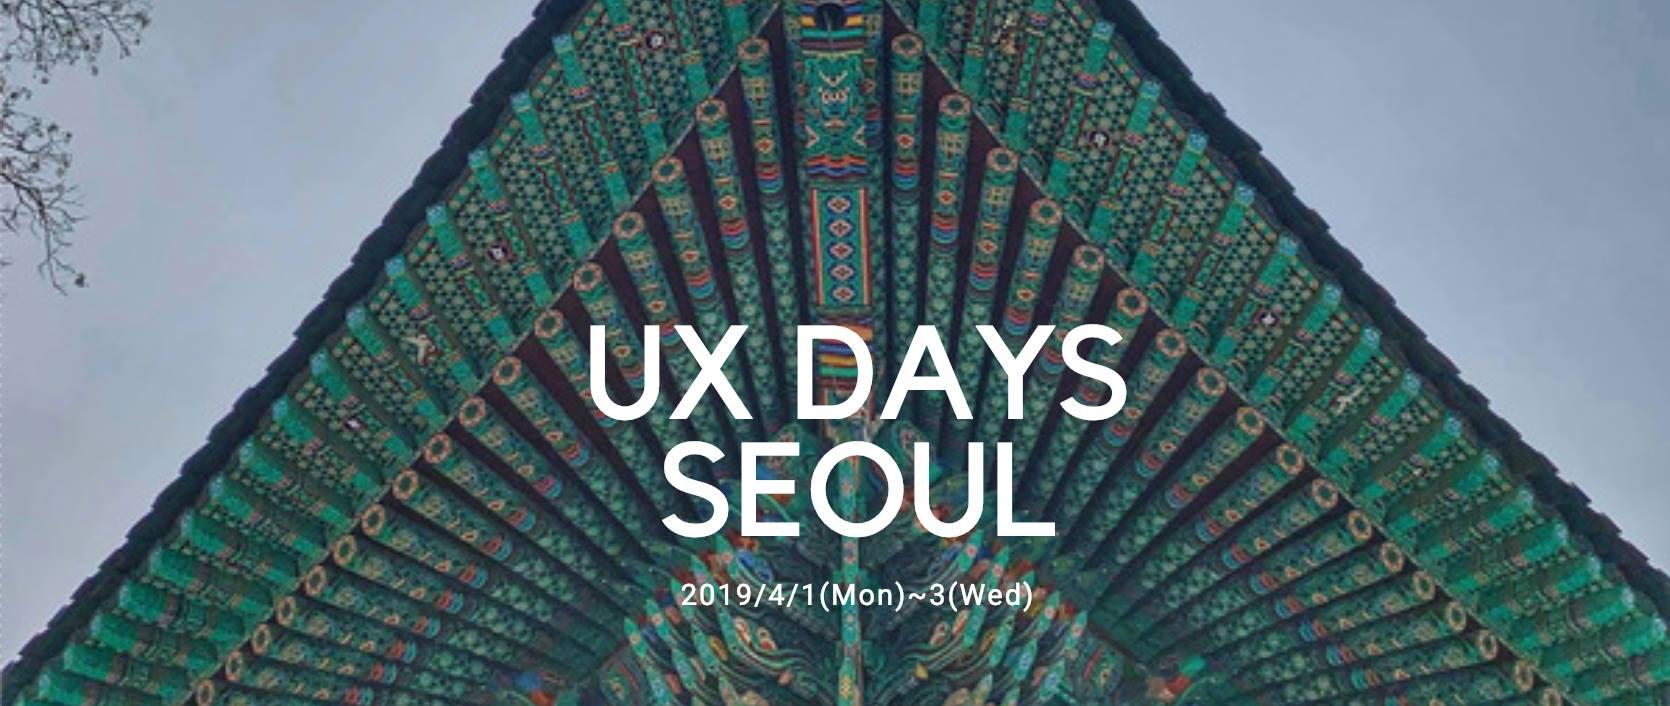 ux days seoul